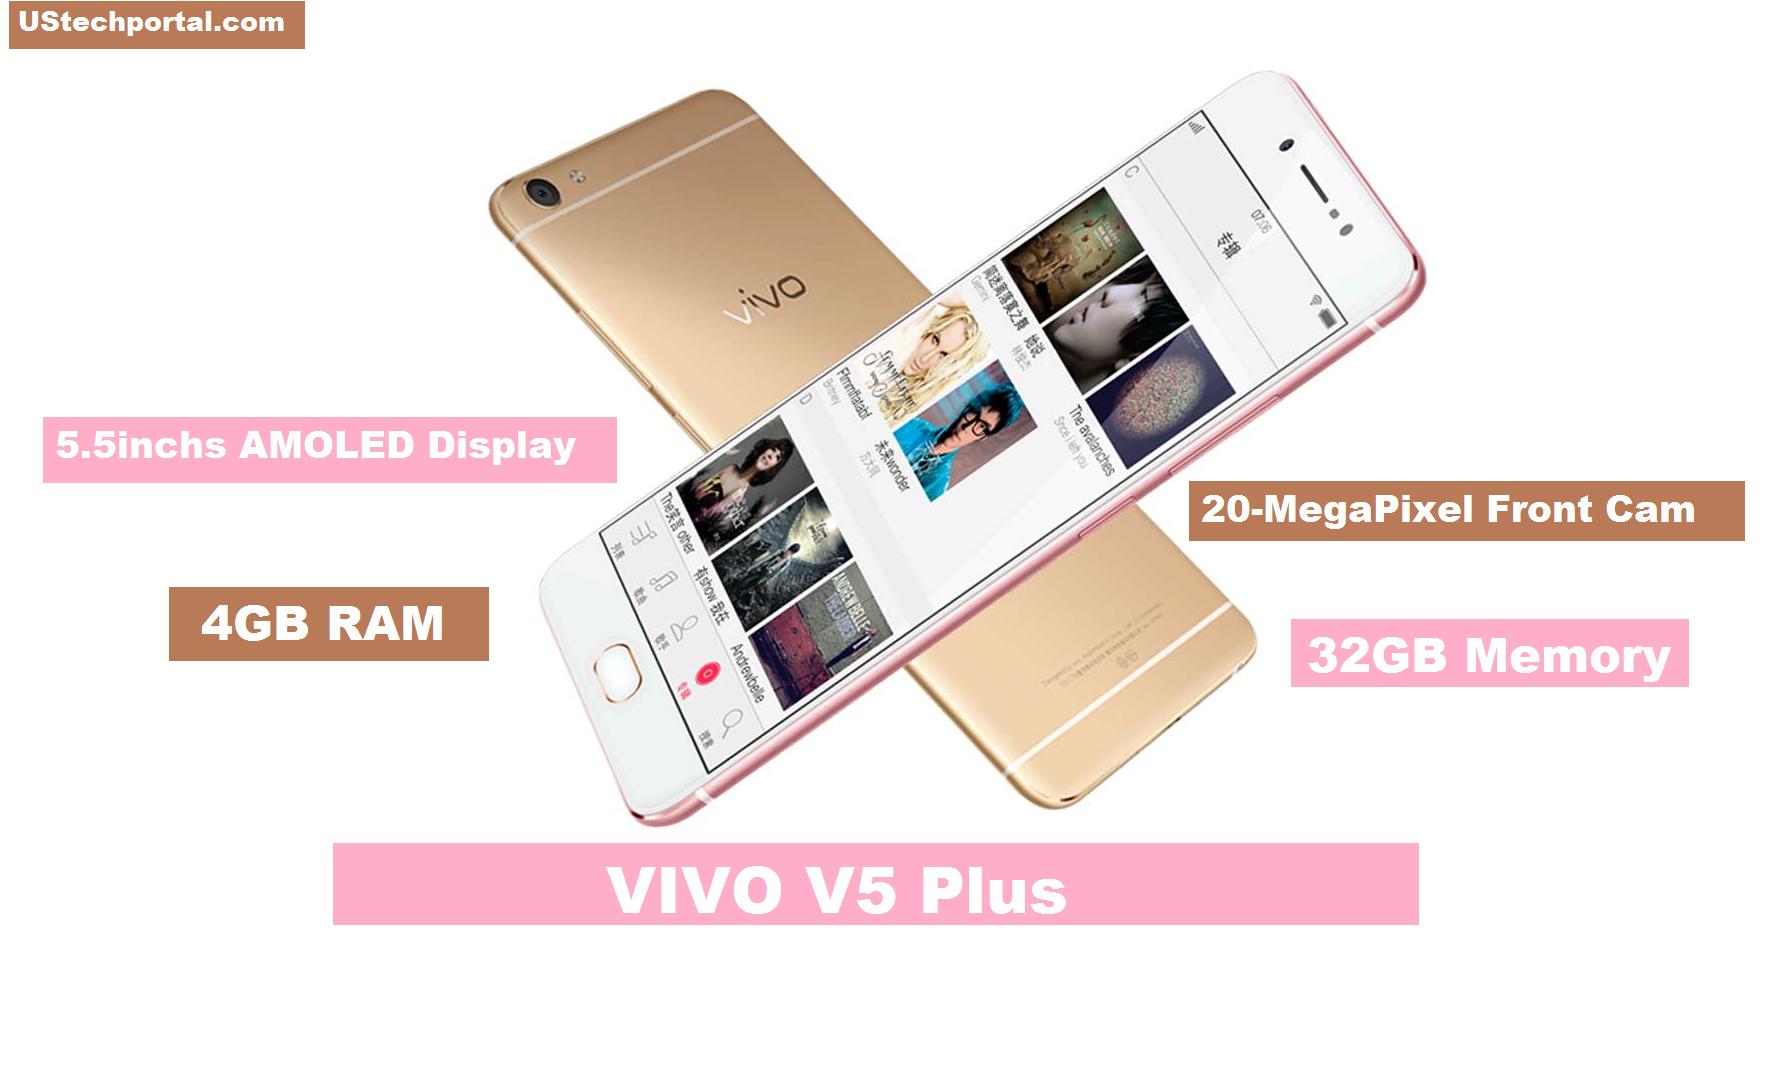 Vivo V5 Plus Review